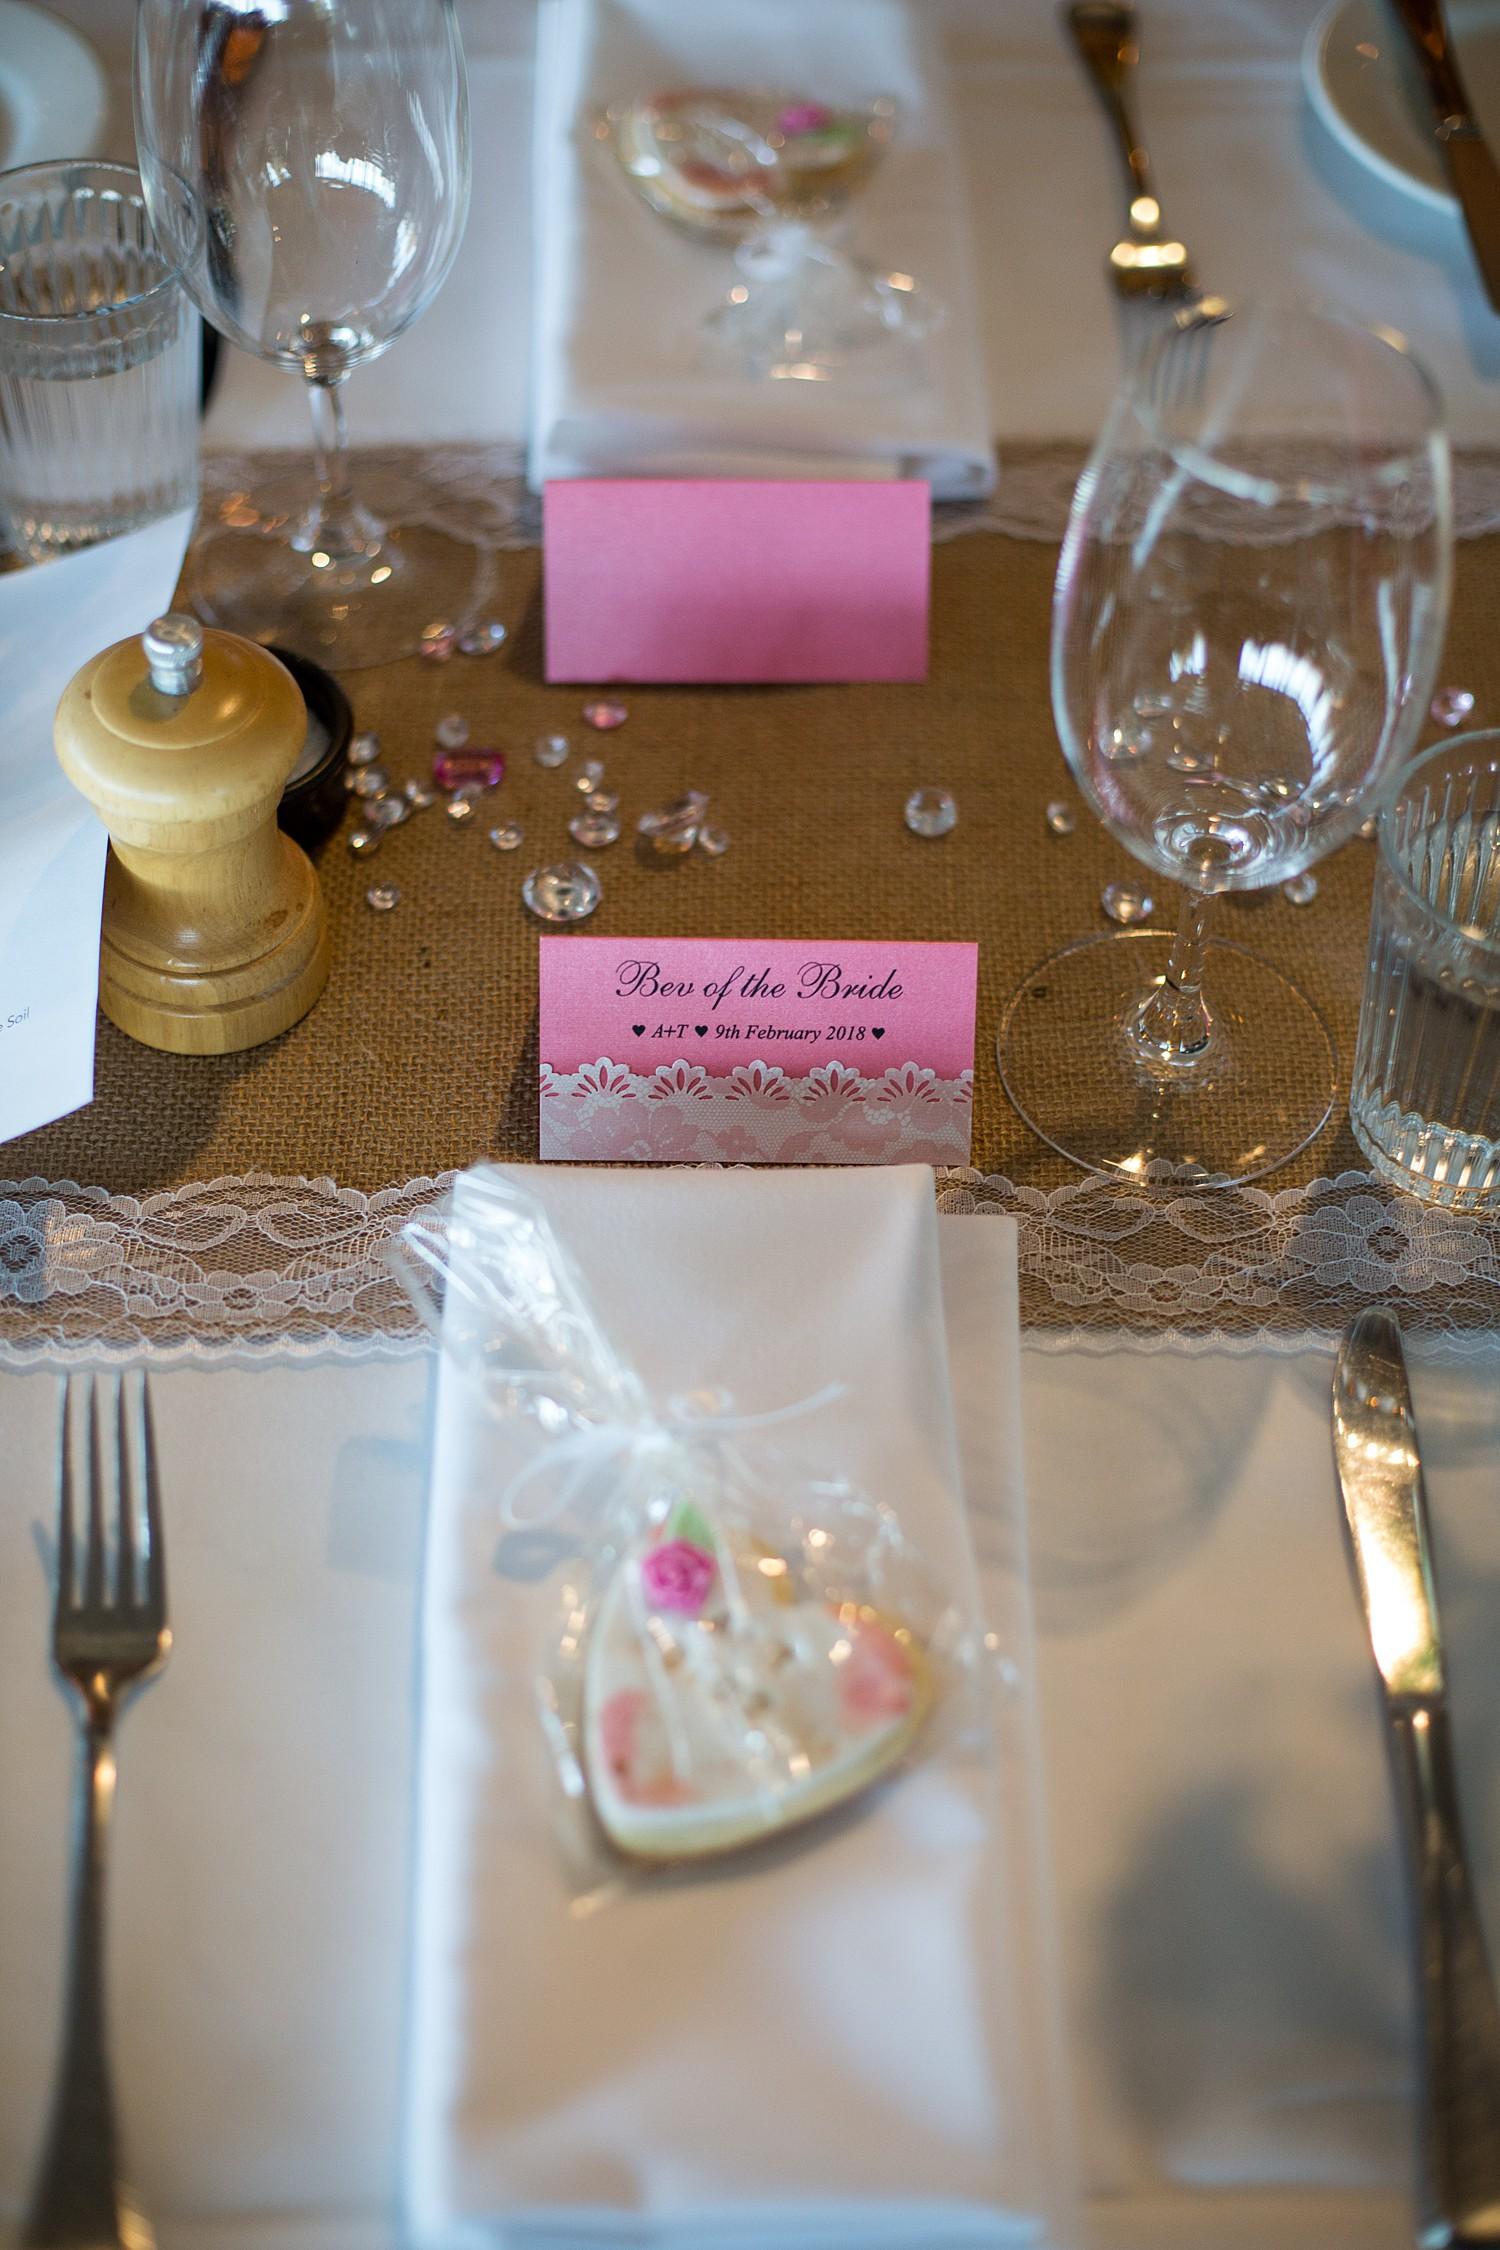 wise_wines_southwest_WA_wedding_0119.jpg